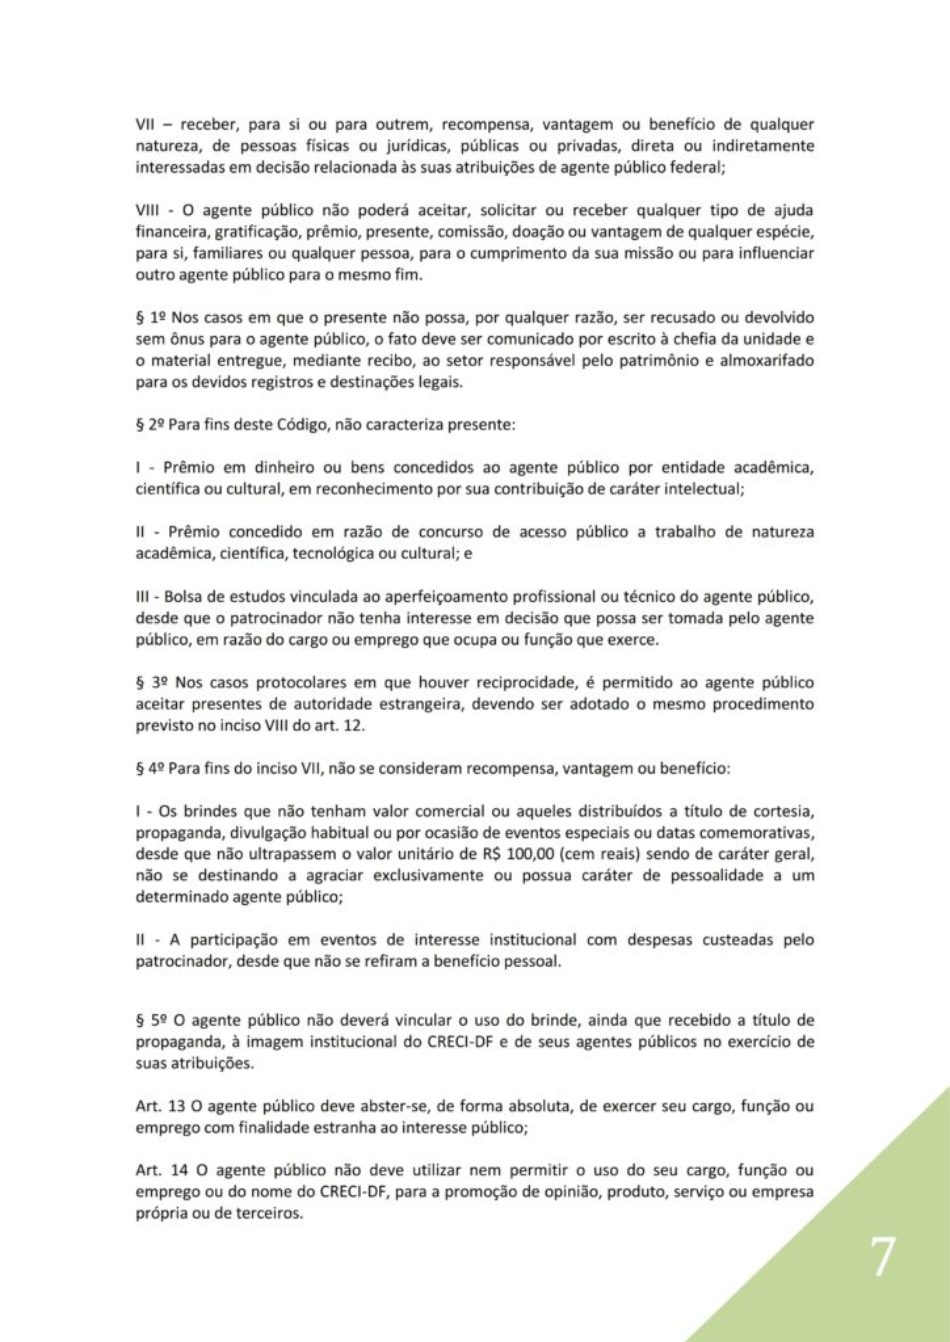 CÓDIGO DE CONDUTA ÉTICA.pdf_page_11